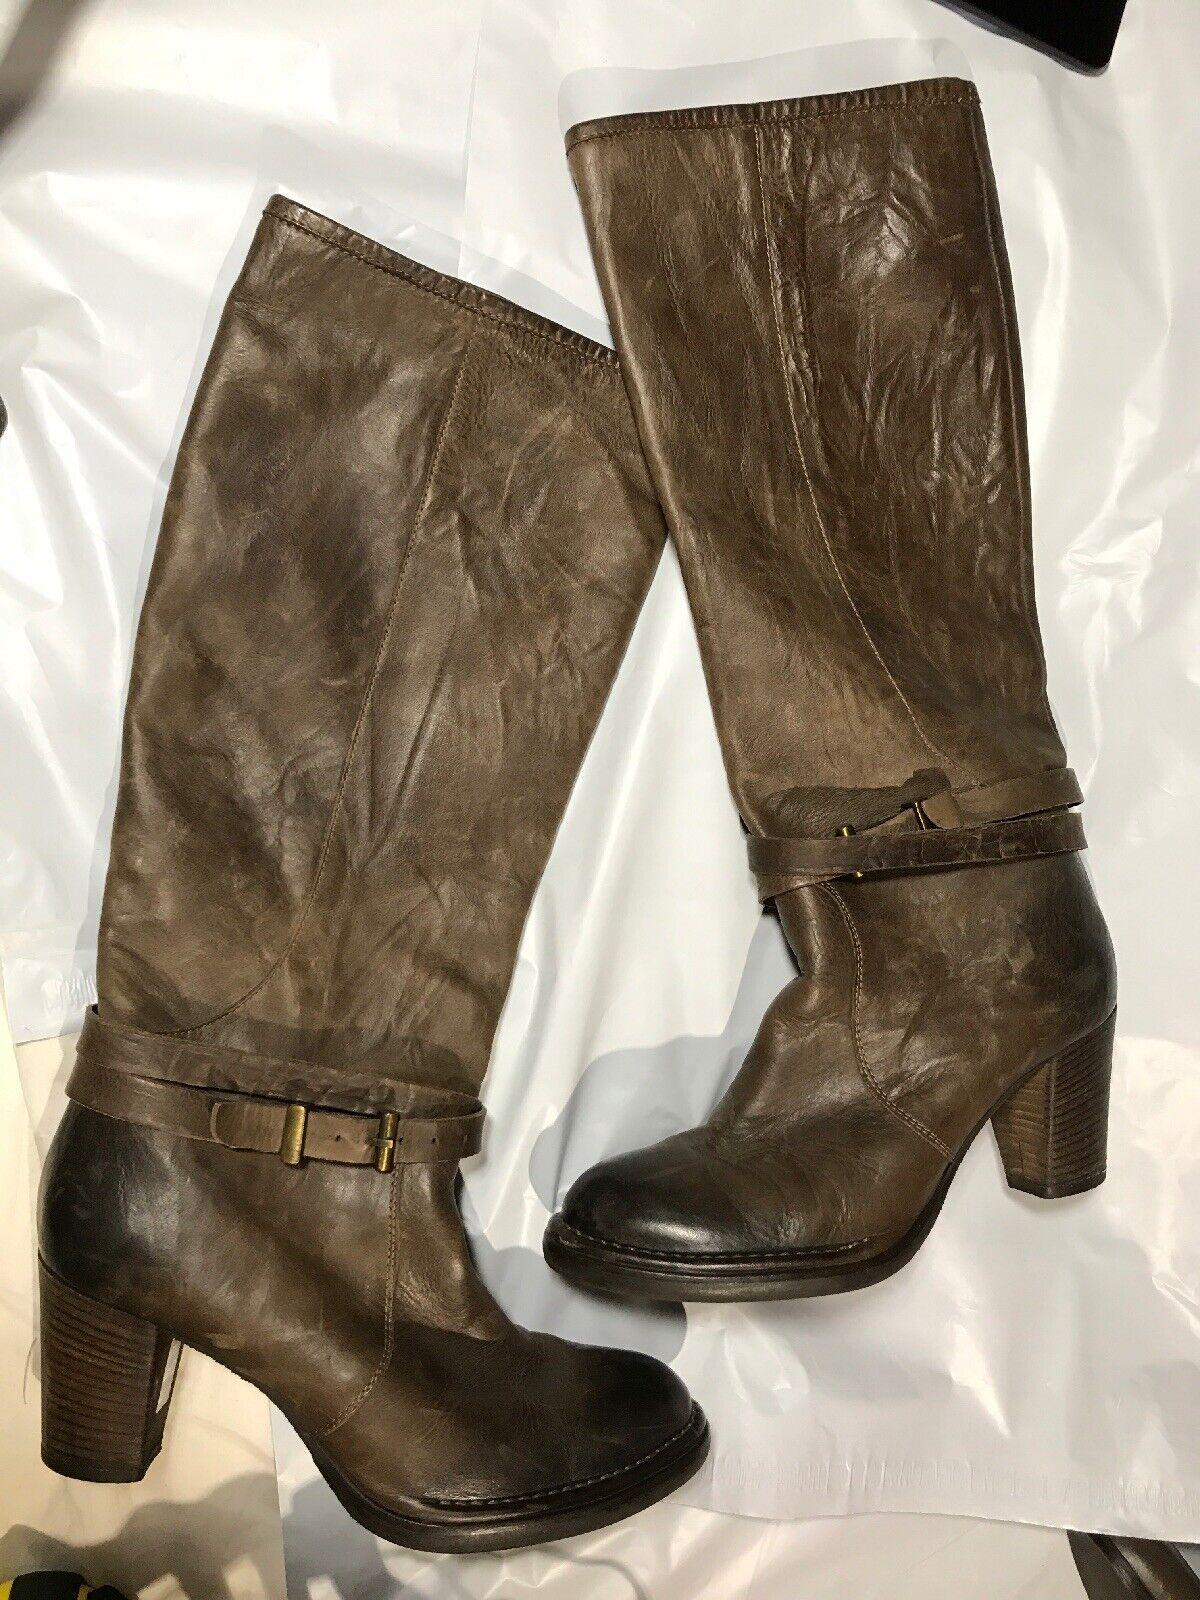 Damenschuhe Stiefel in braunem Leder